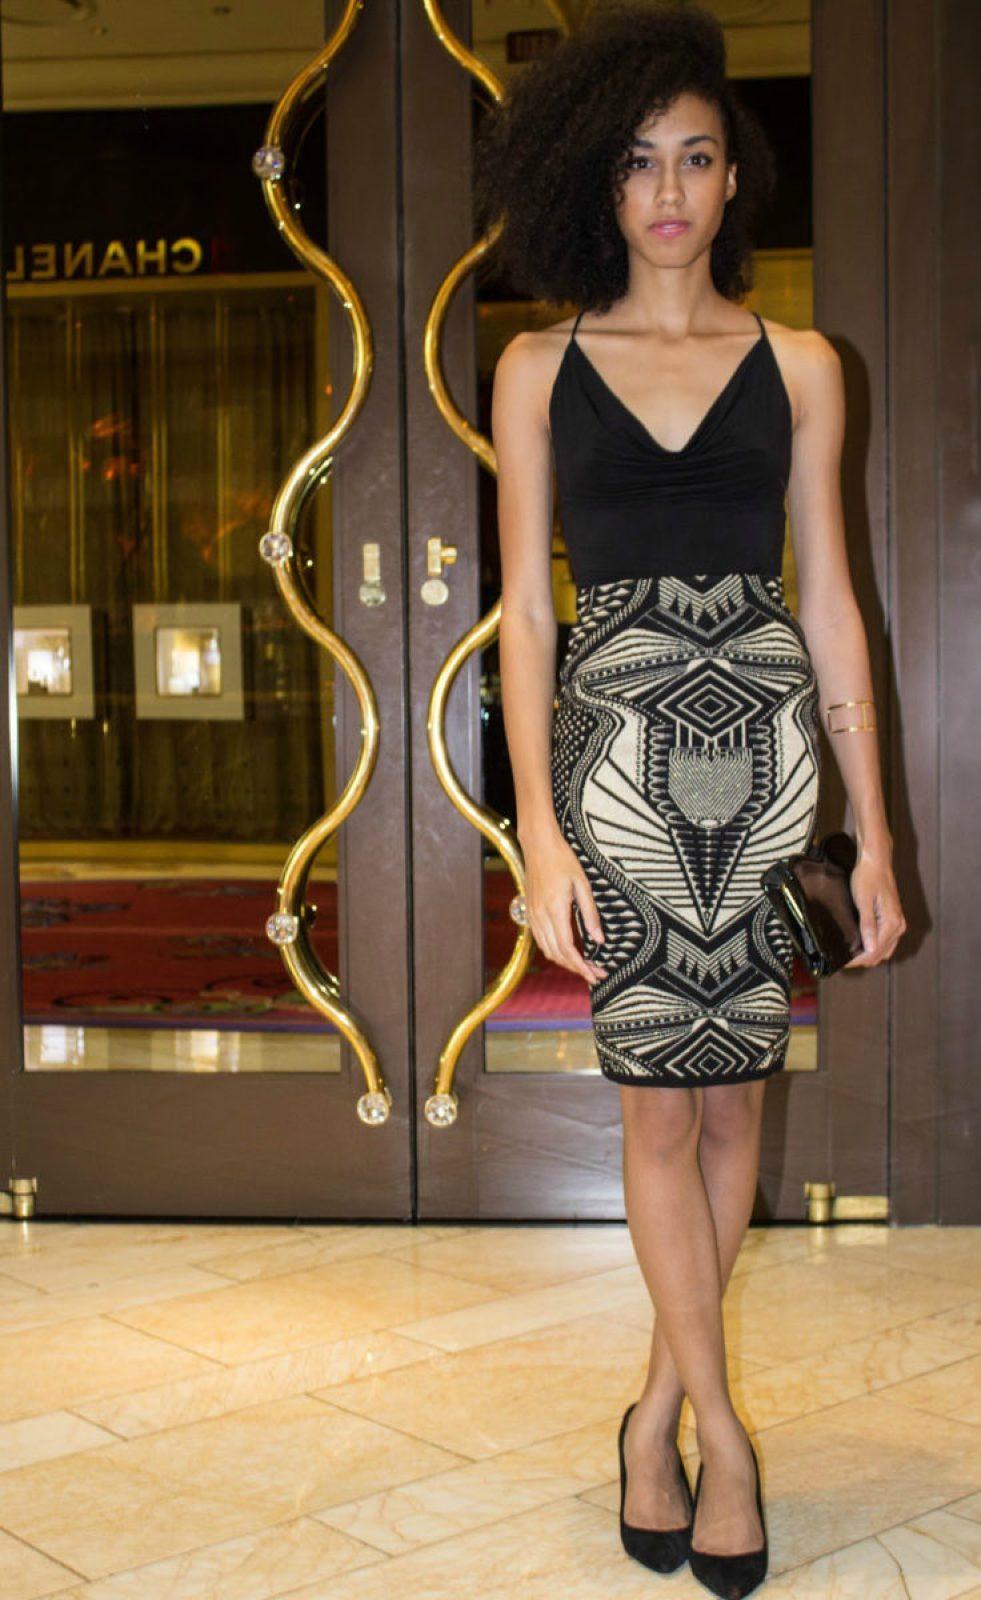 Vegas-night-club-outfit